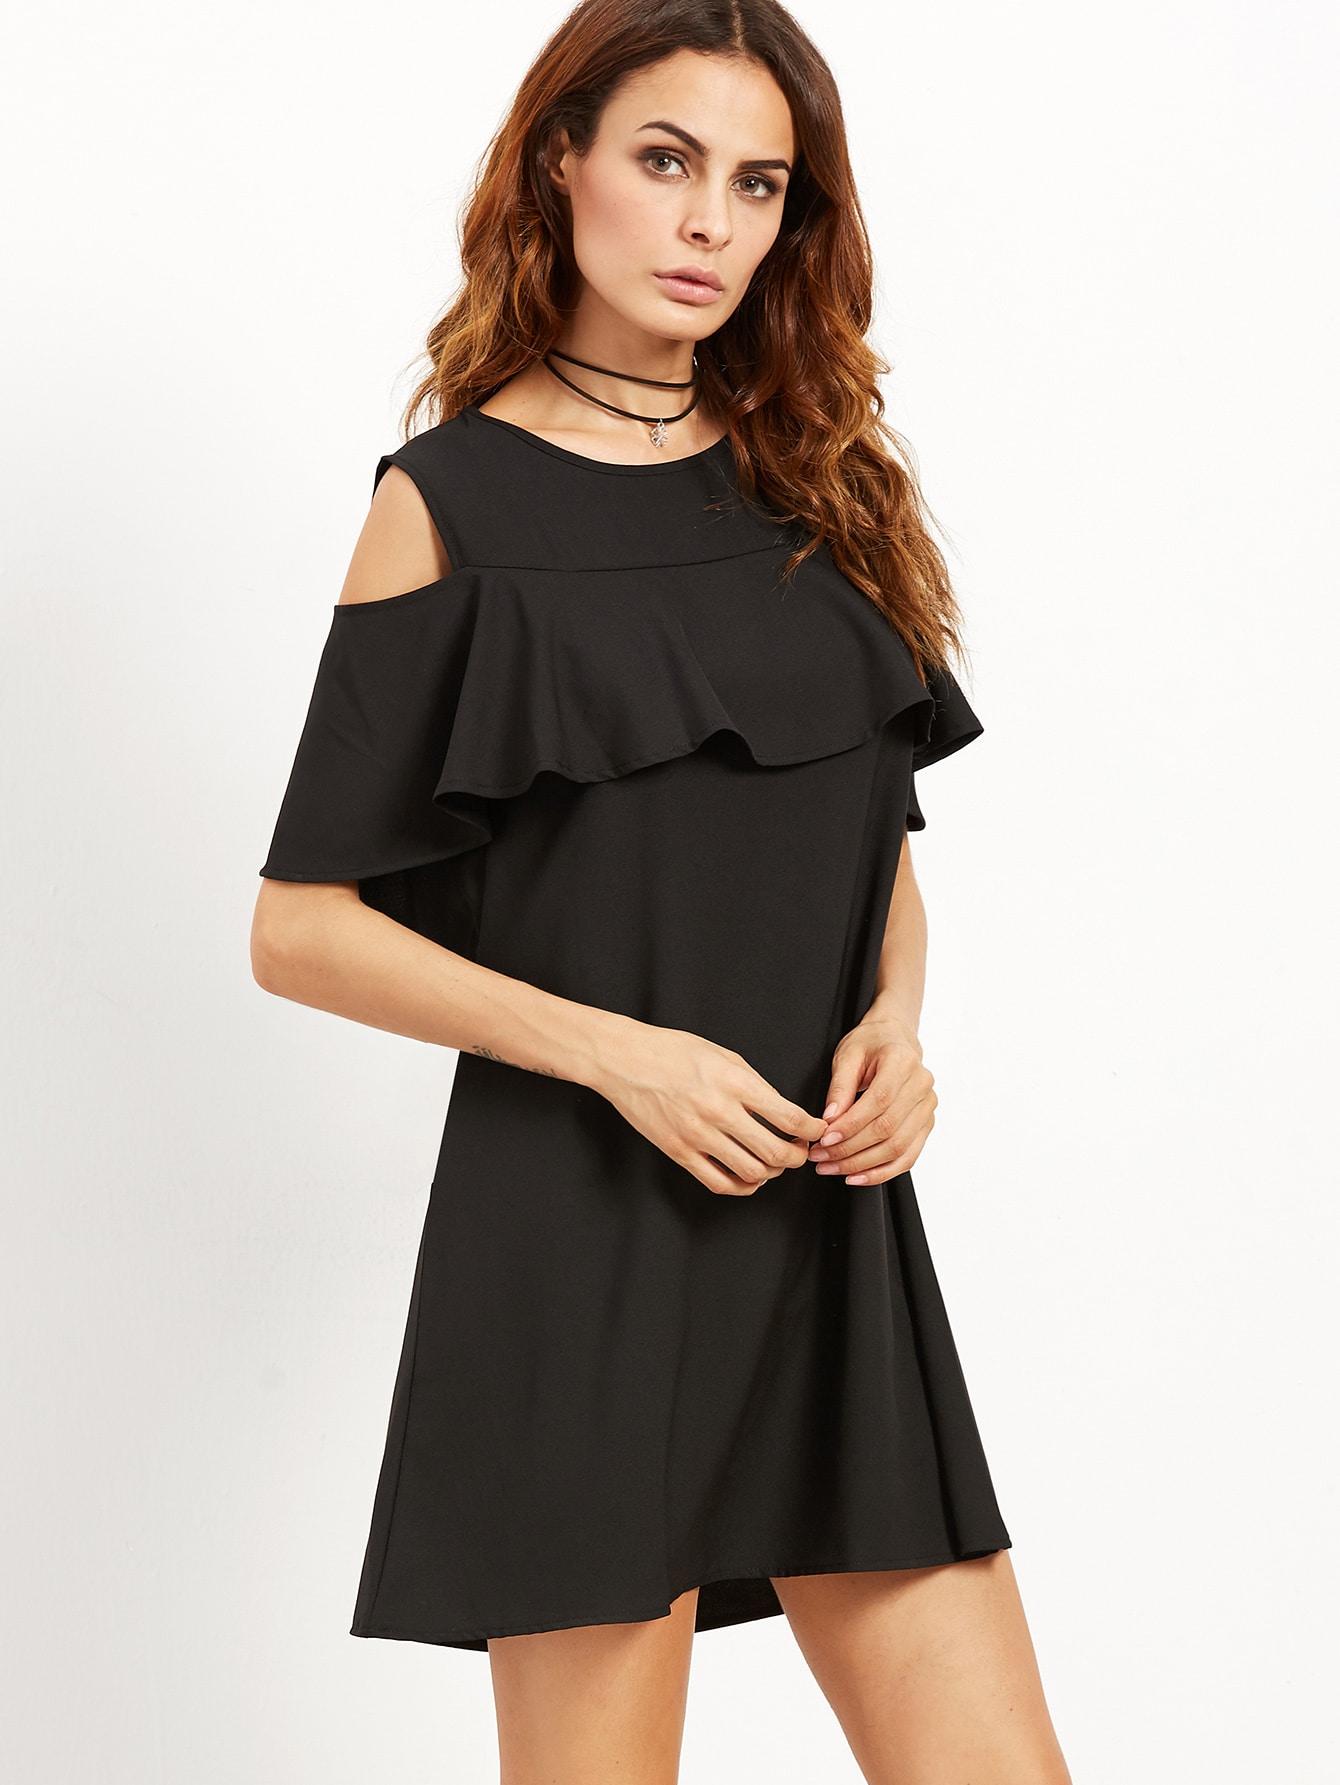 Black Open Shoulder Ruffle DressBlack Open Shoulder Ruffle Dress<br><br>color: Black<br>size: L,M,S